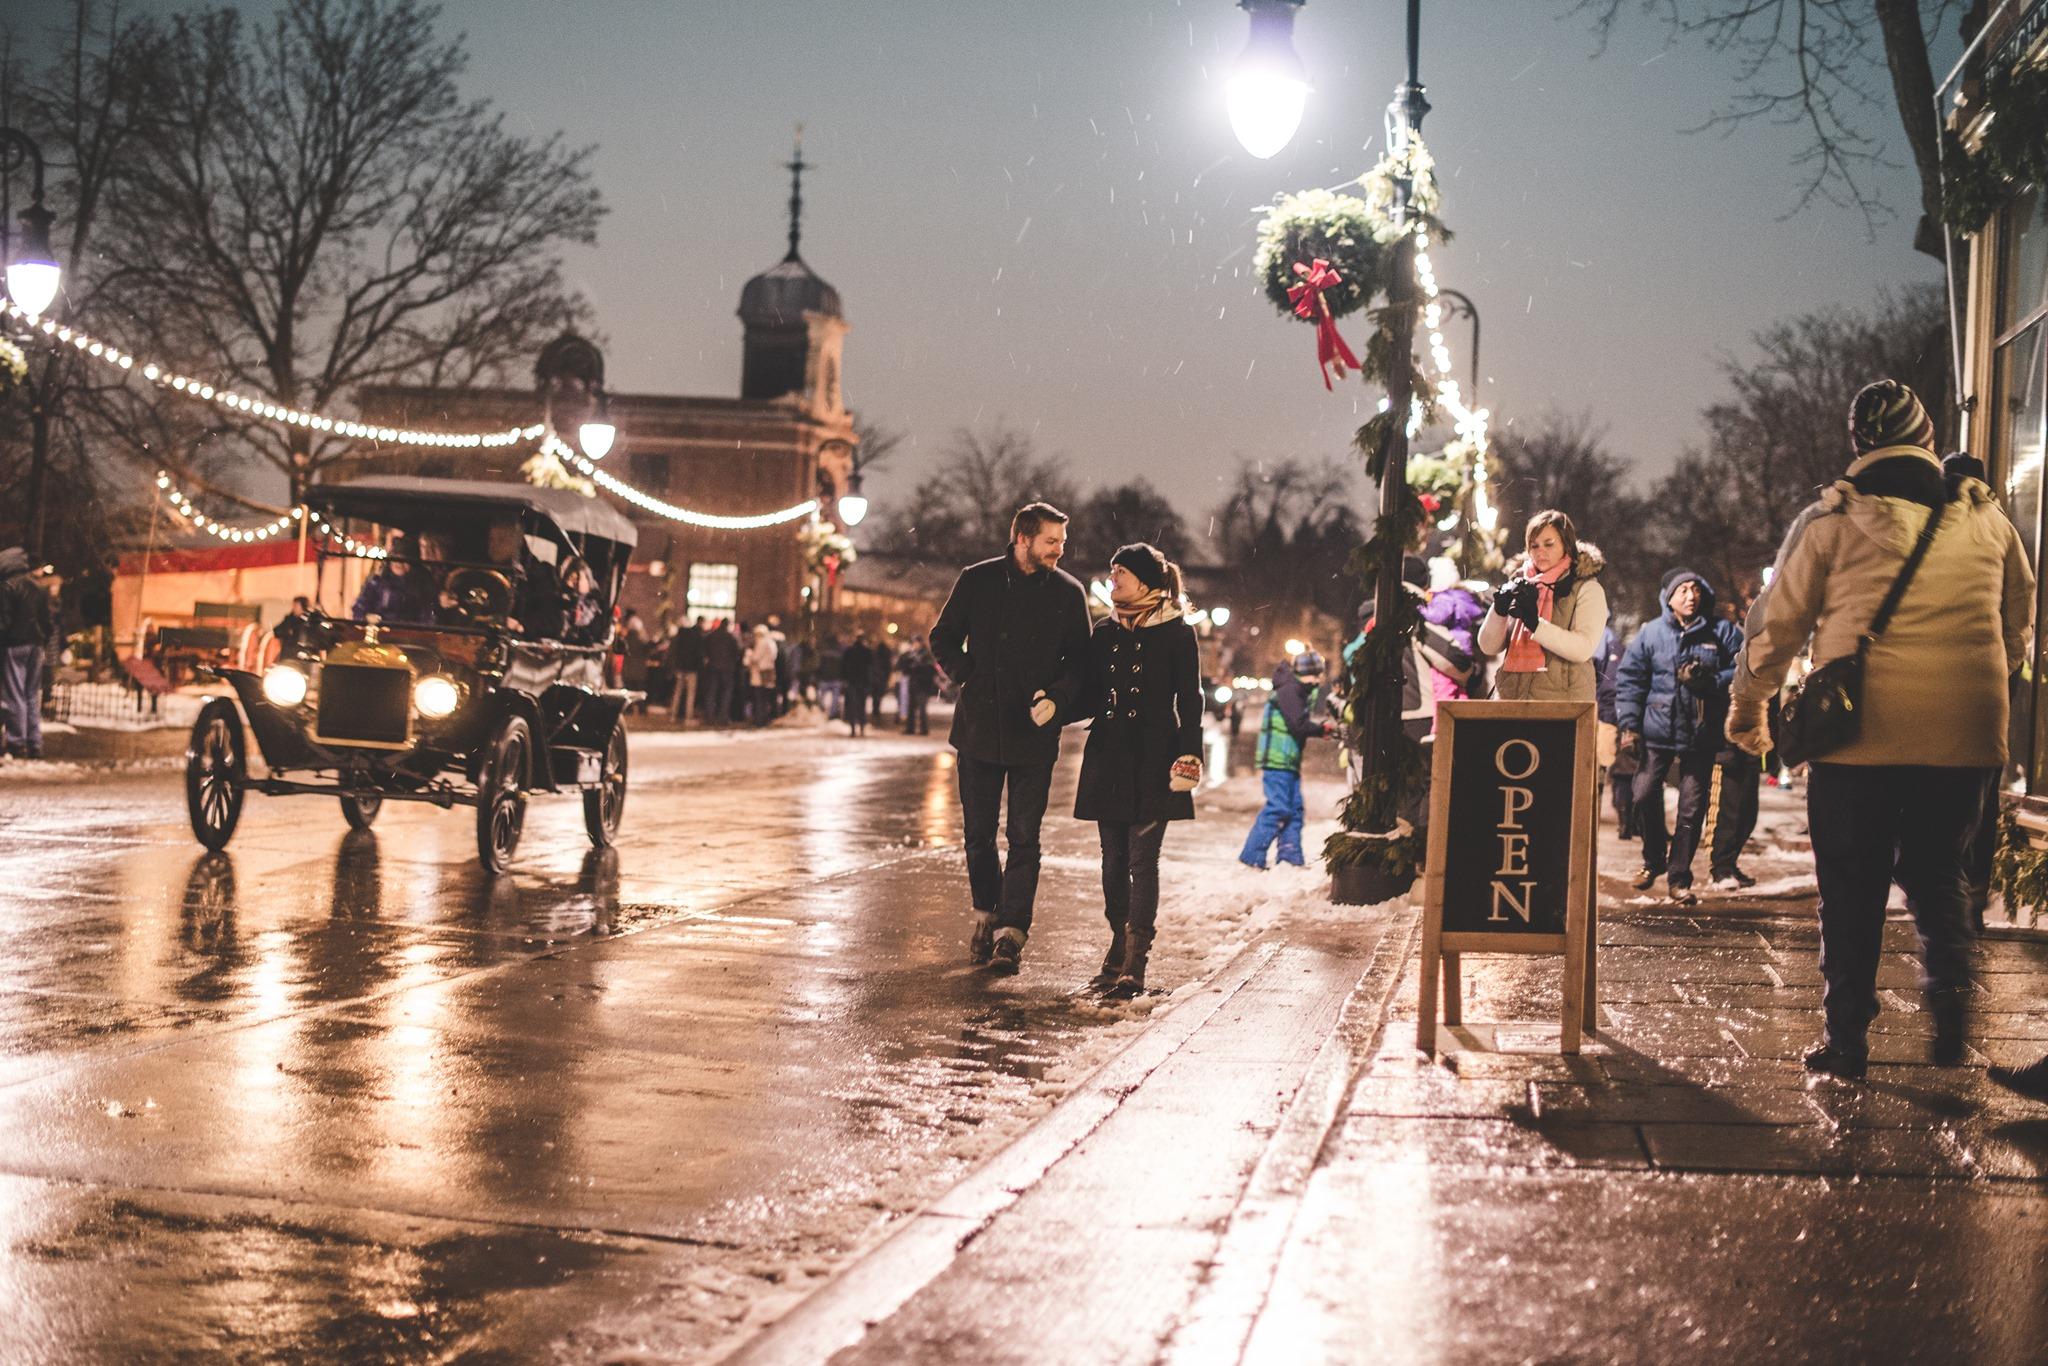 Holiday Nights at Greenfield Village, Dearborn, MI photo courtesy Greenfield Village